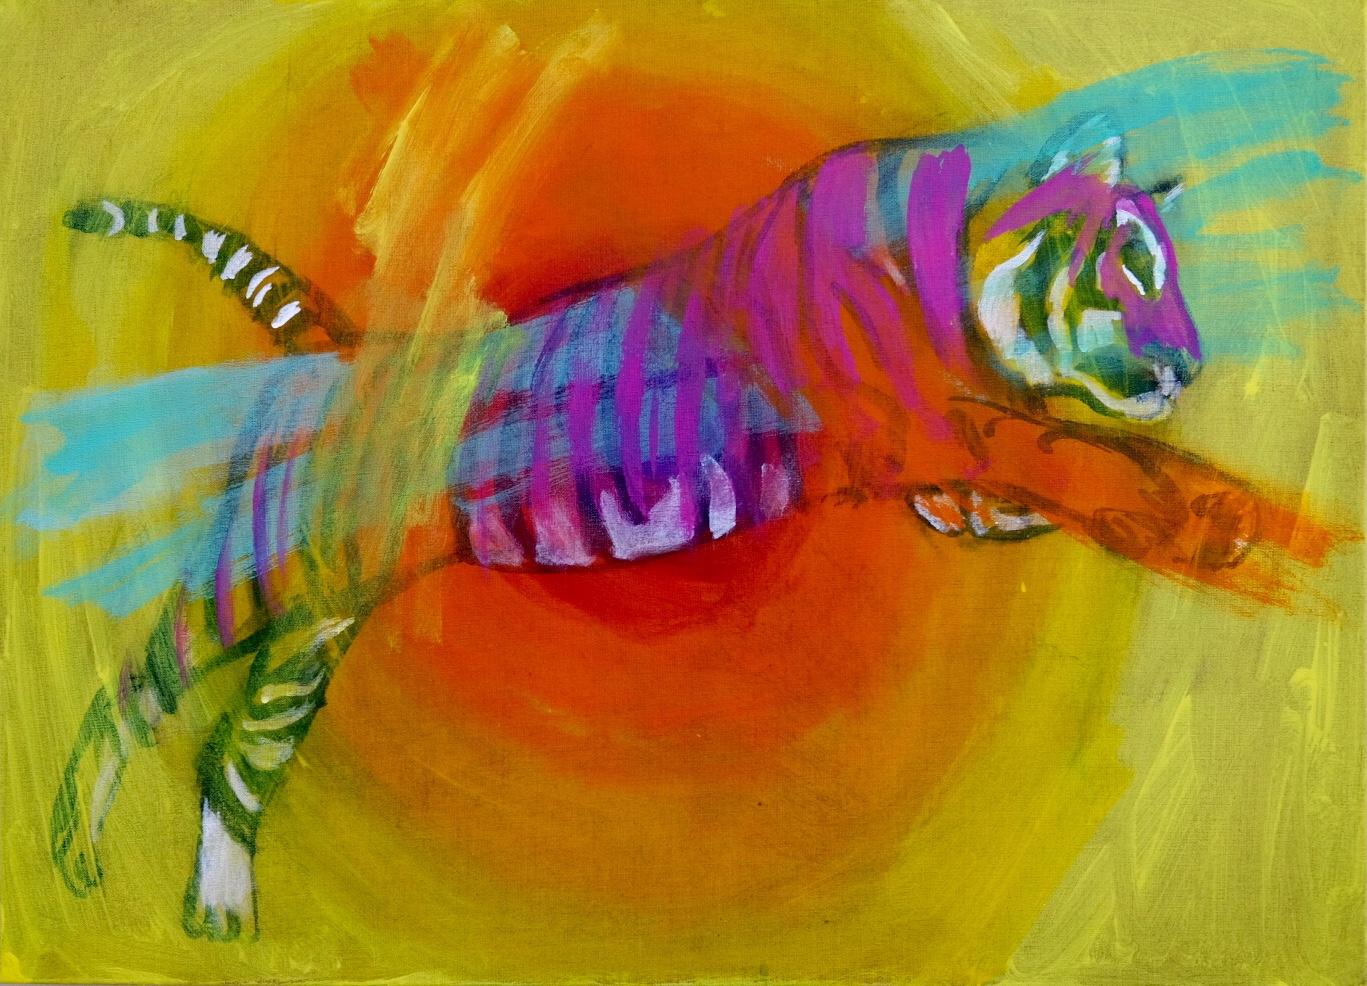 Tiger leap. 73x100 cm. 2019. Acrylic on canvas. (In progress)